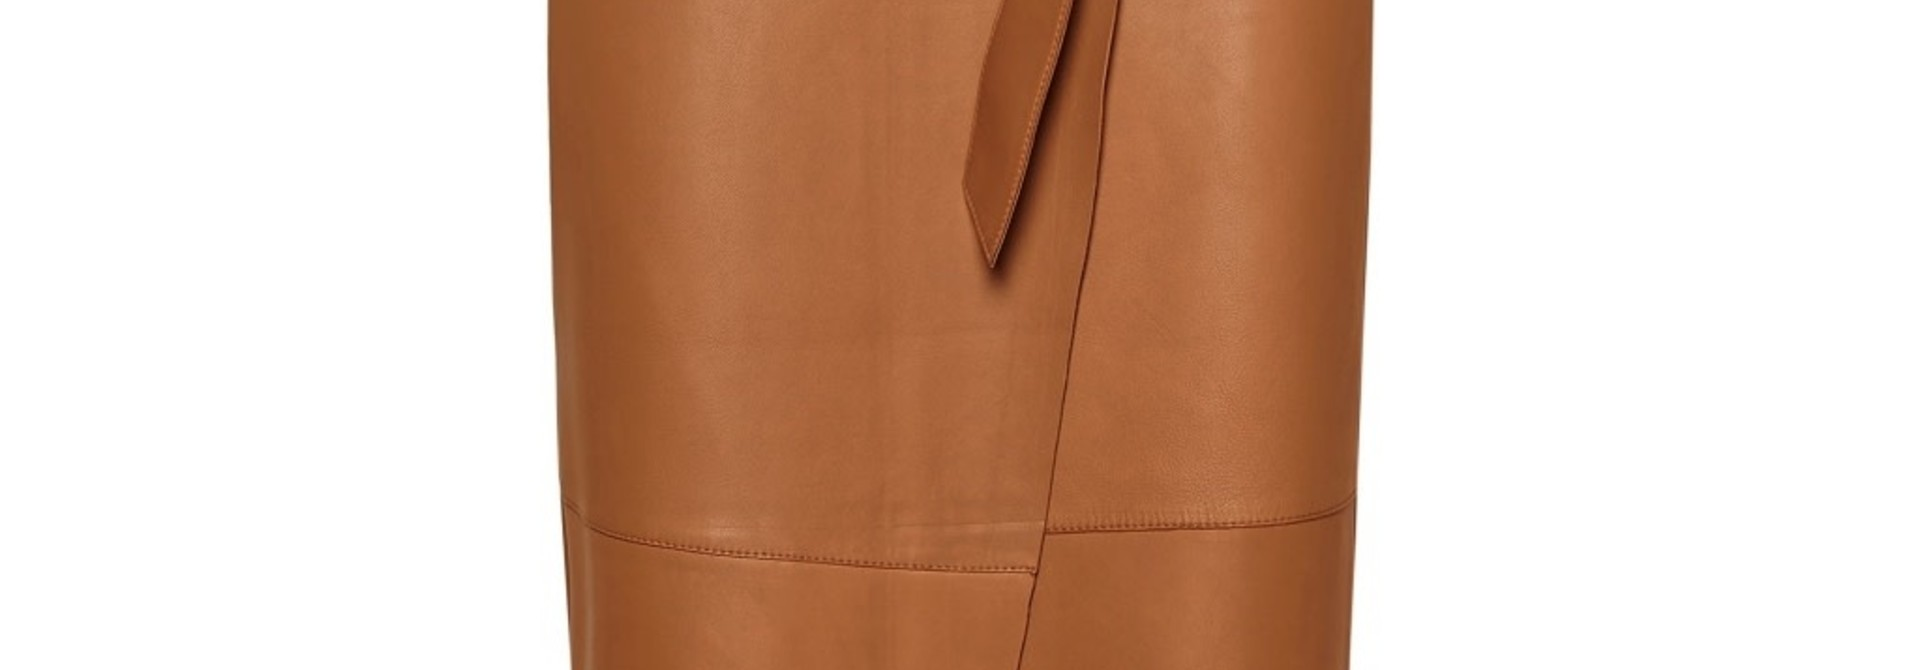 Alba Leather Skirt